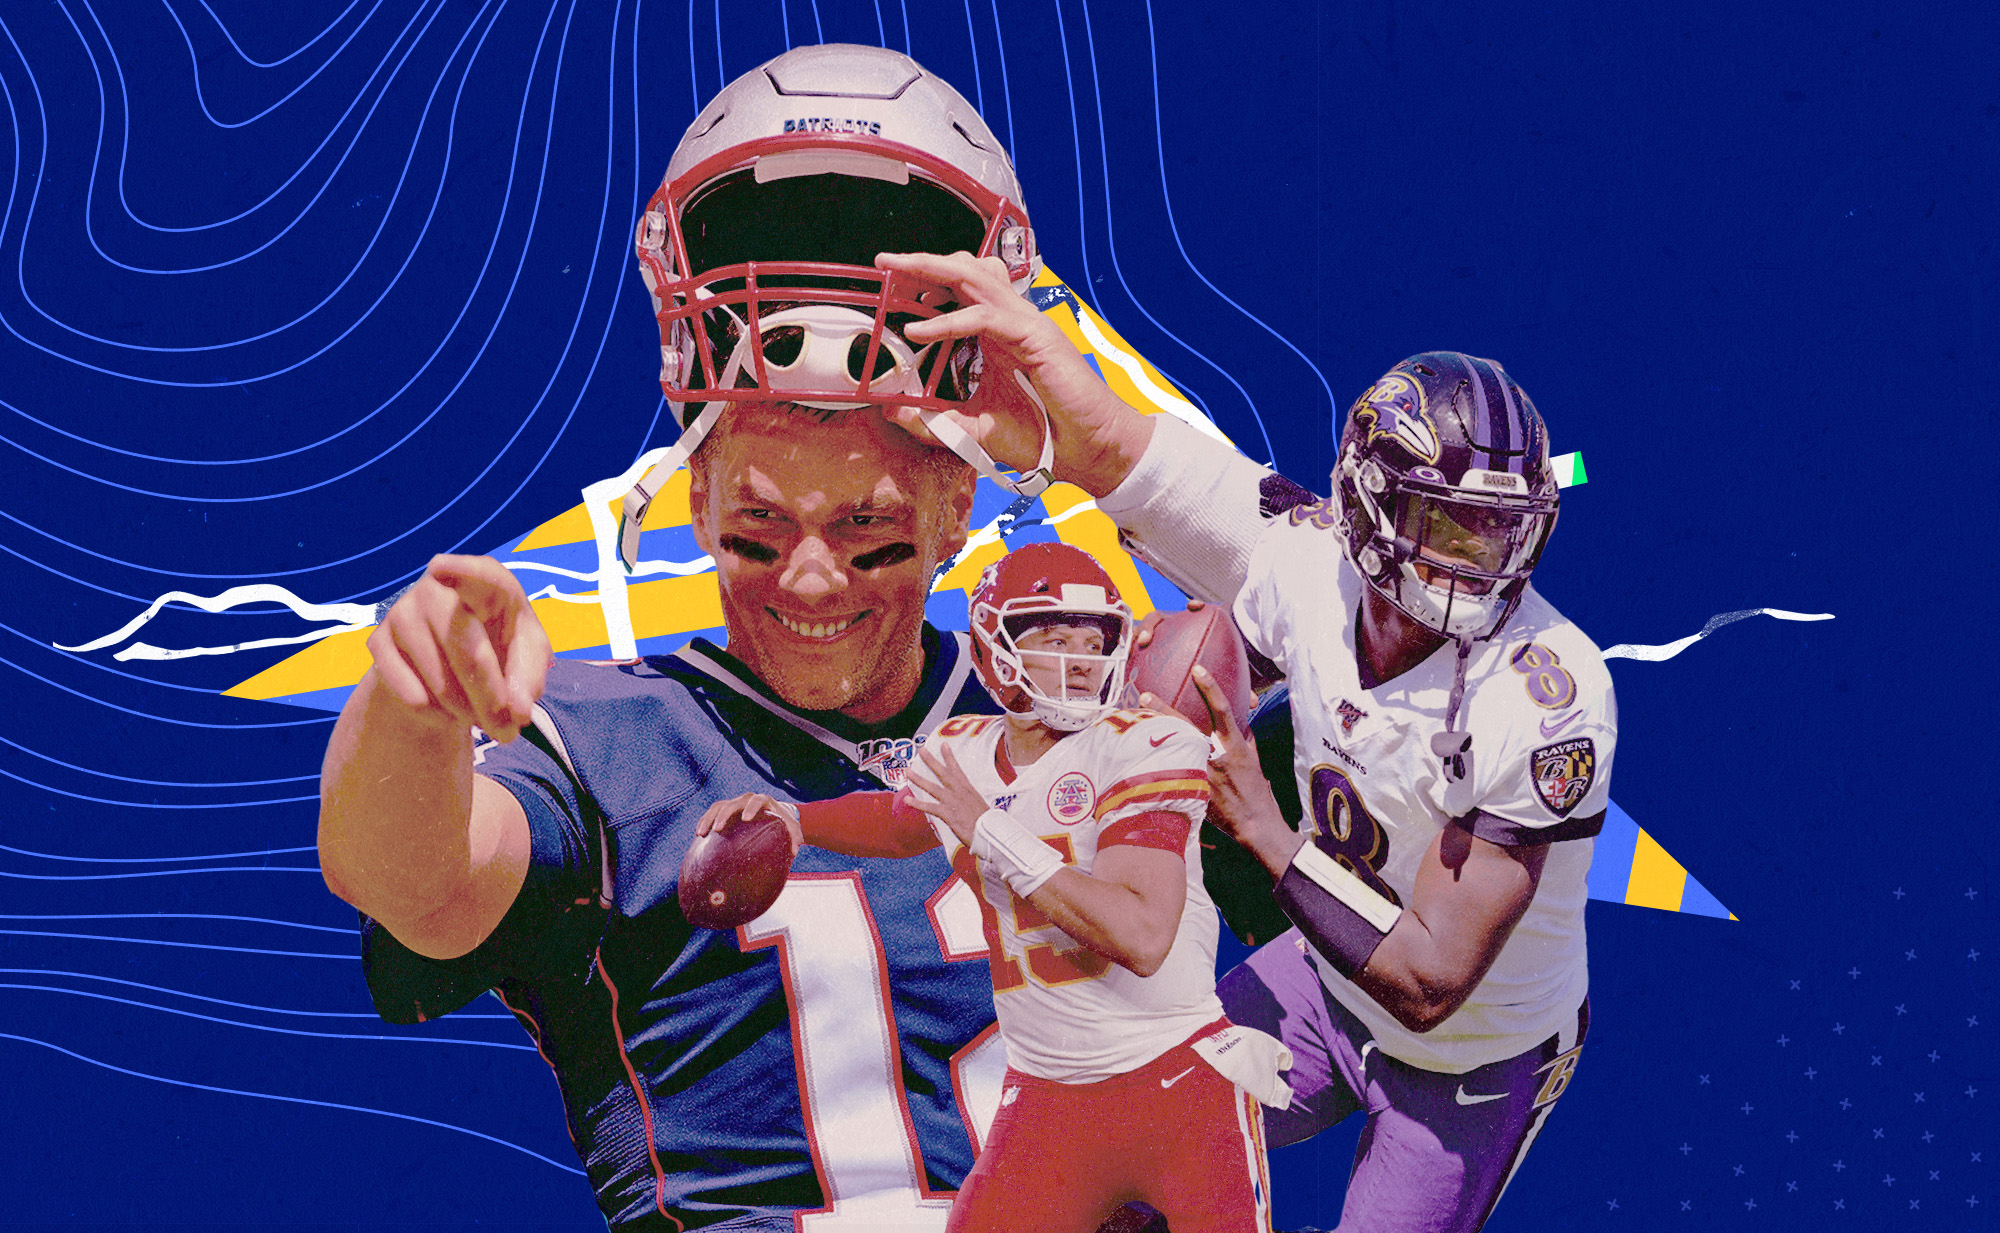 Ranking the NFL MVP candidates each week of the 2019 season